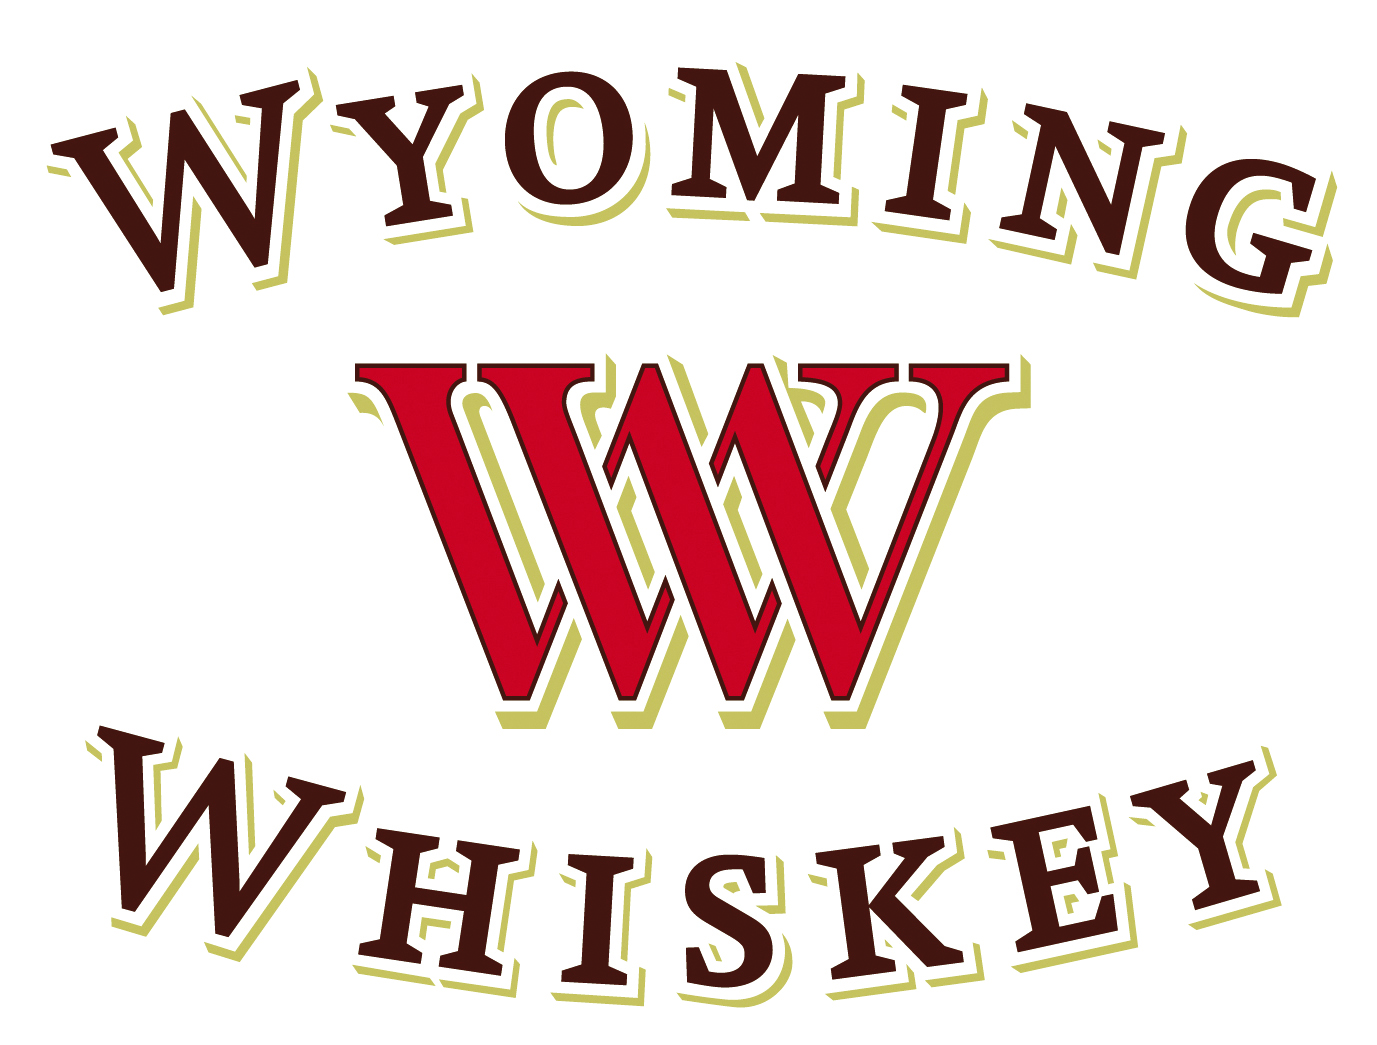 Wyoming-Whiskey1.jpg